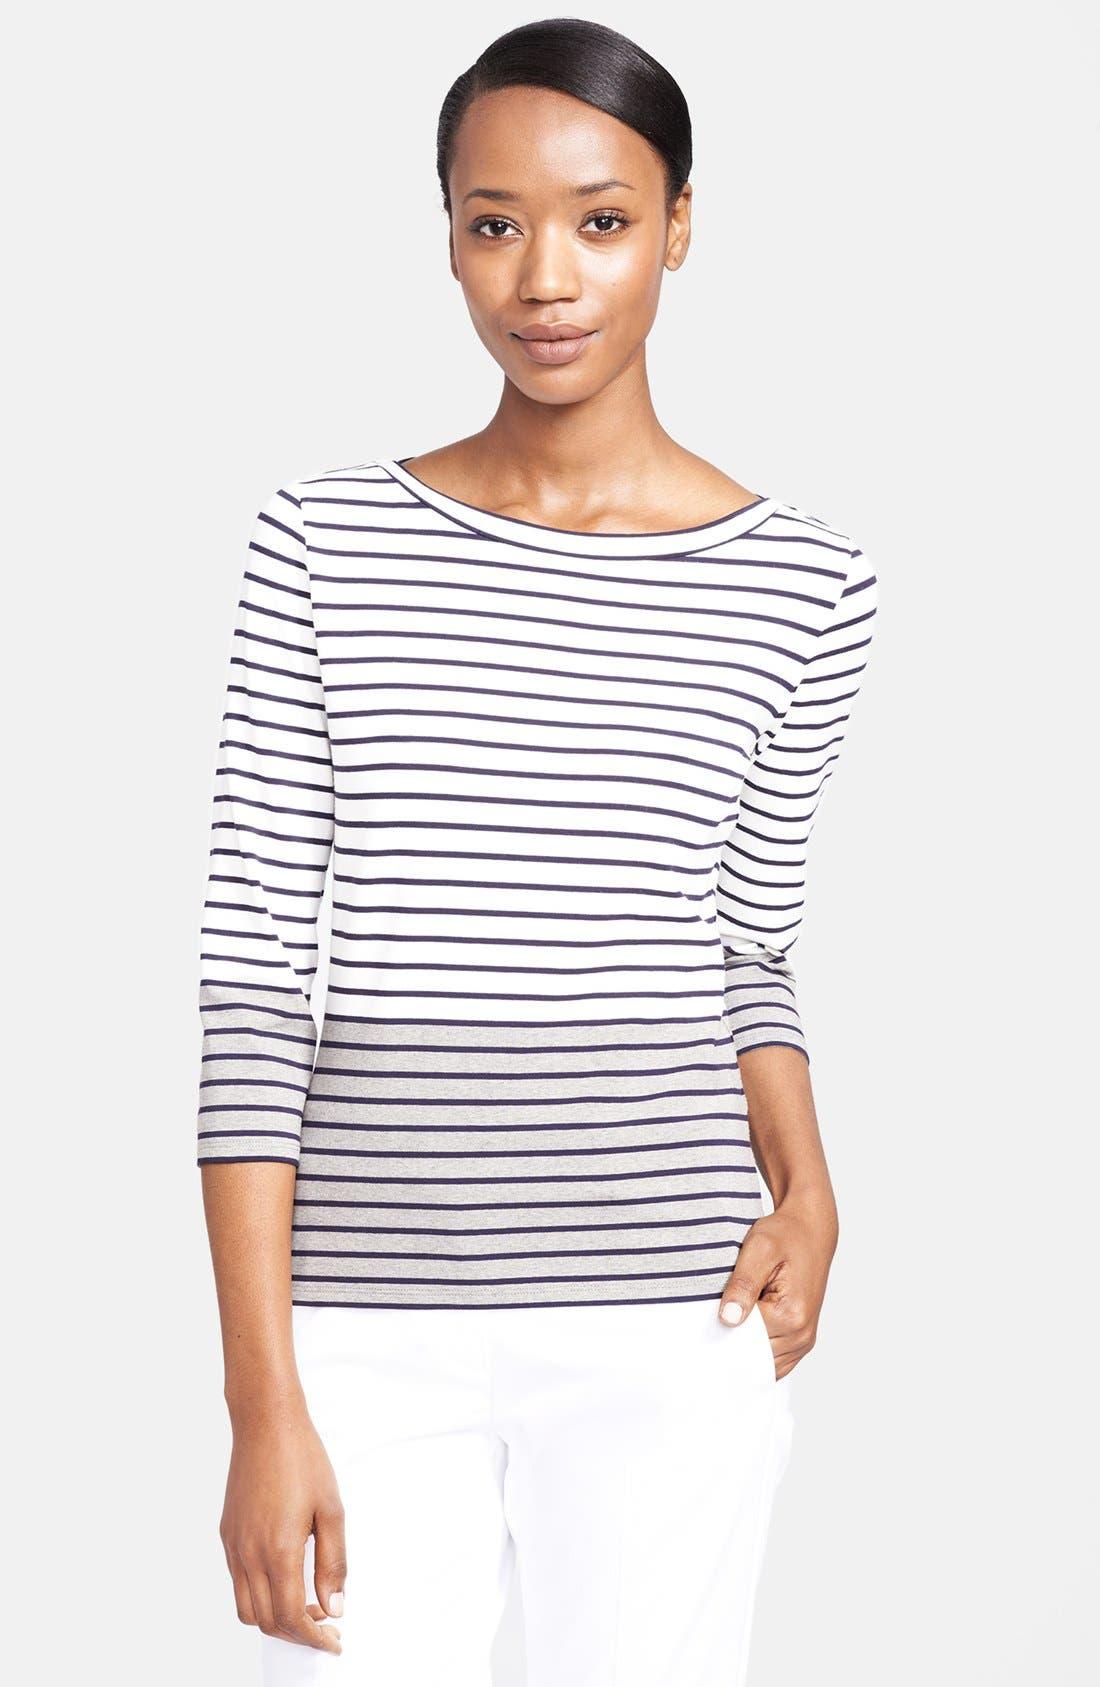 Alternate Image 1 Selected - Max Mara 'Minetta' Stripe Jersey Top